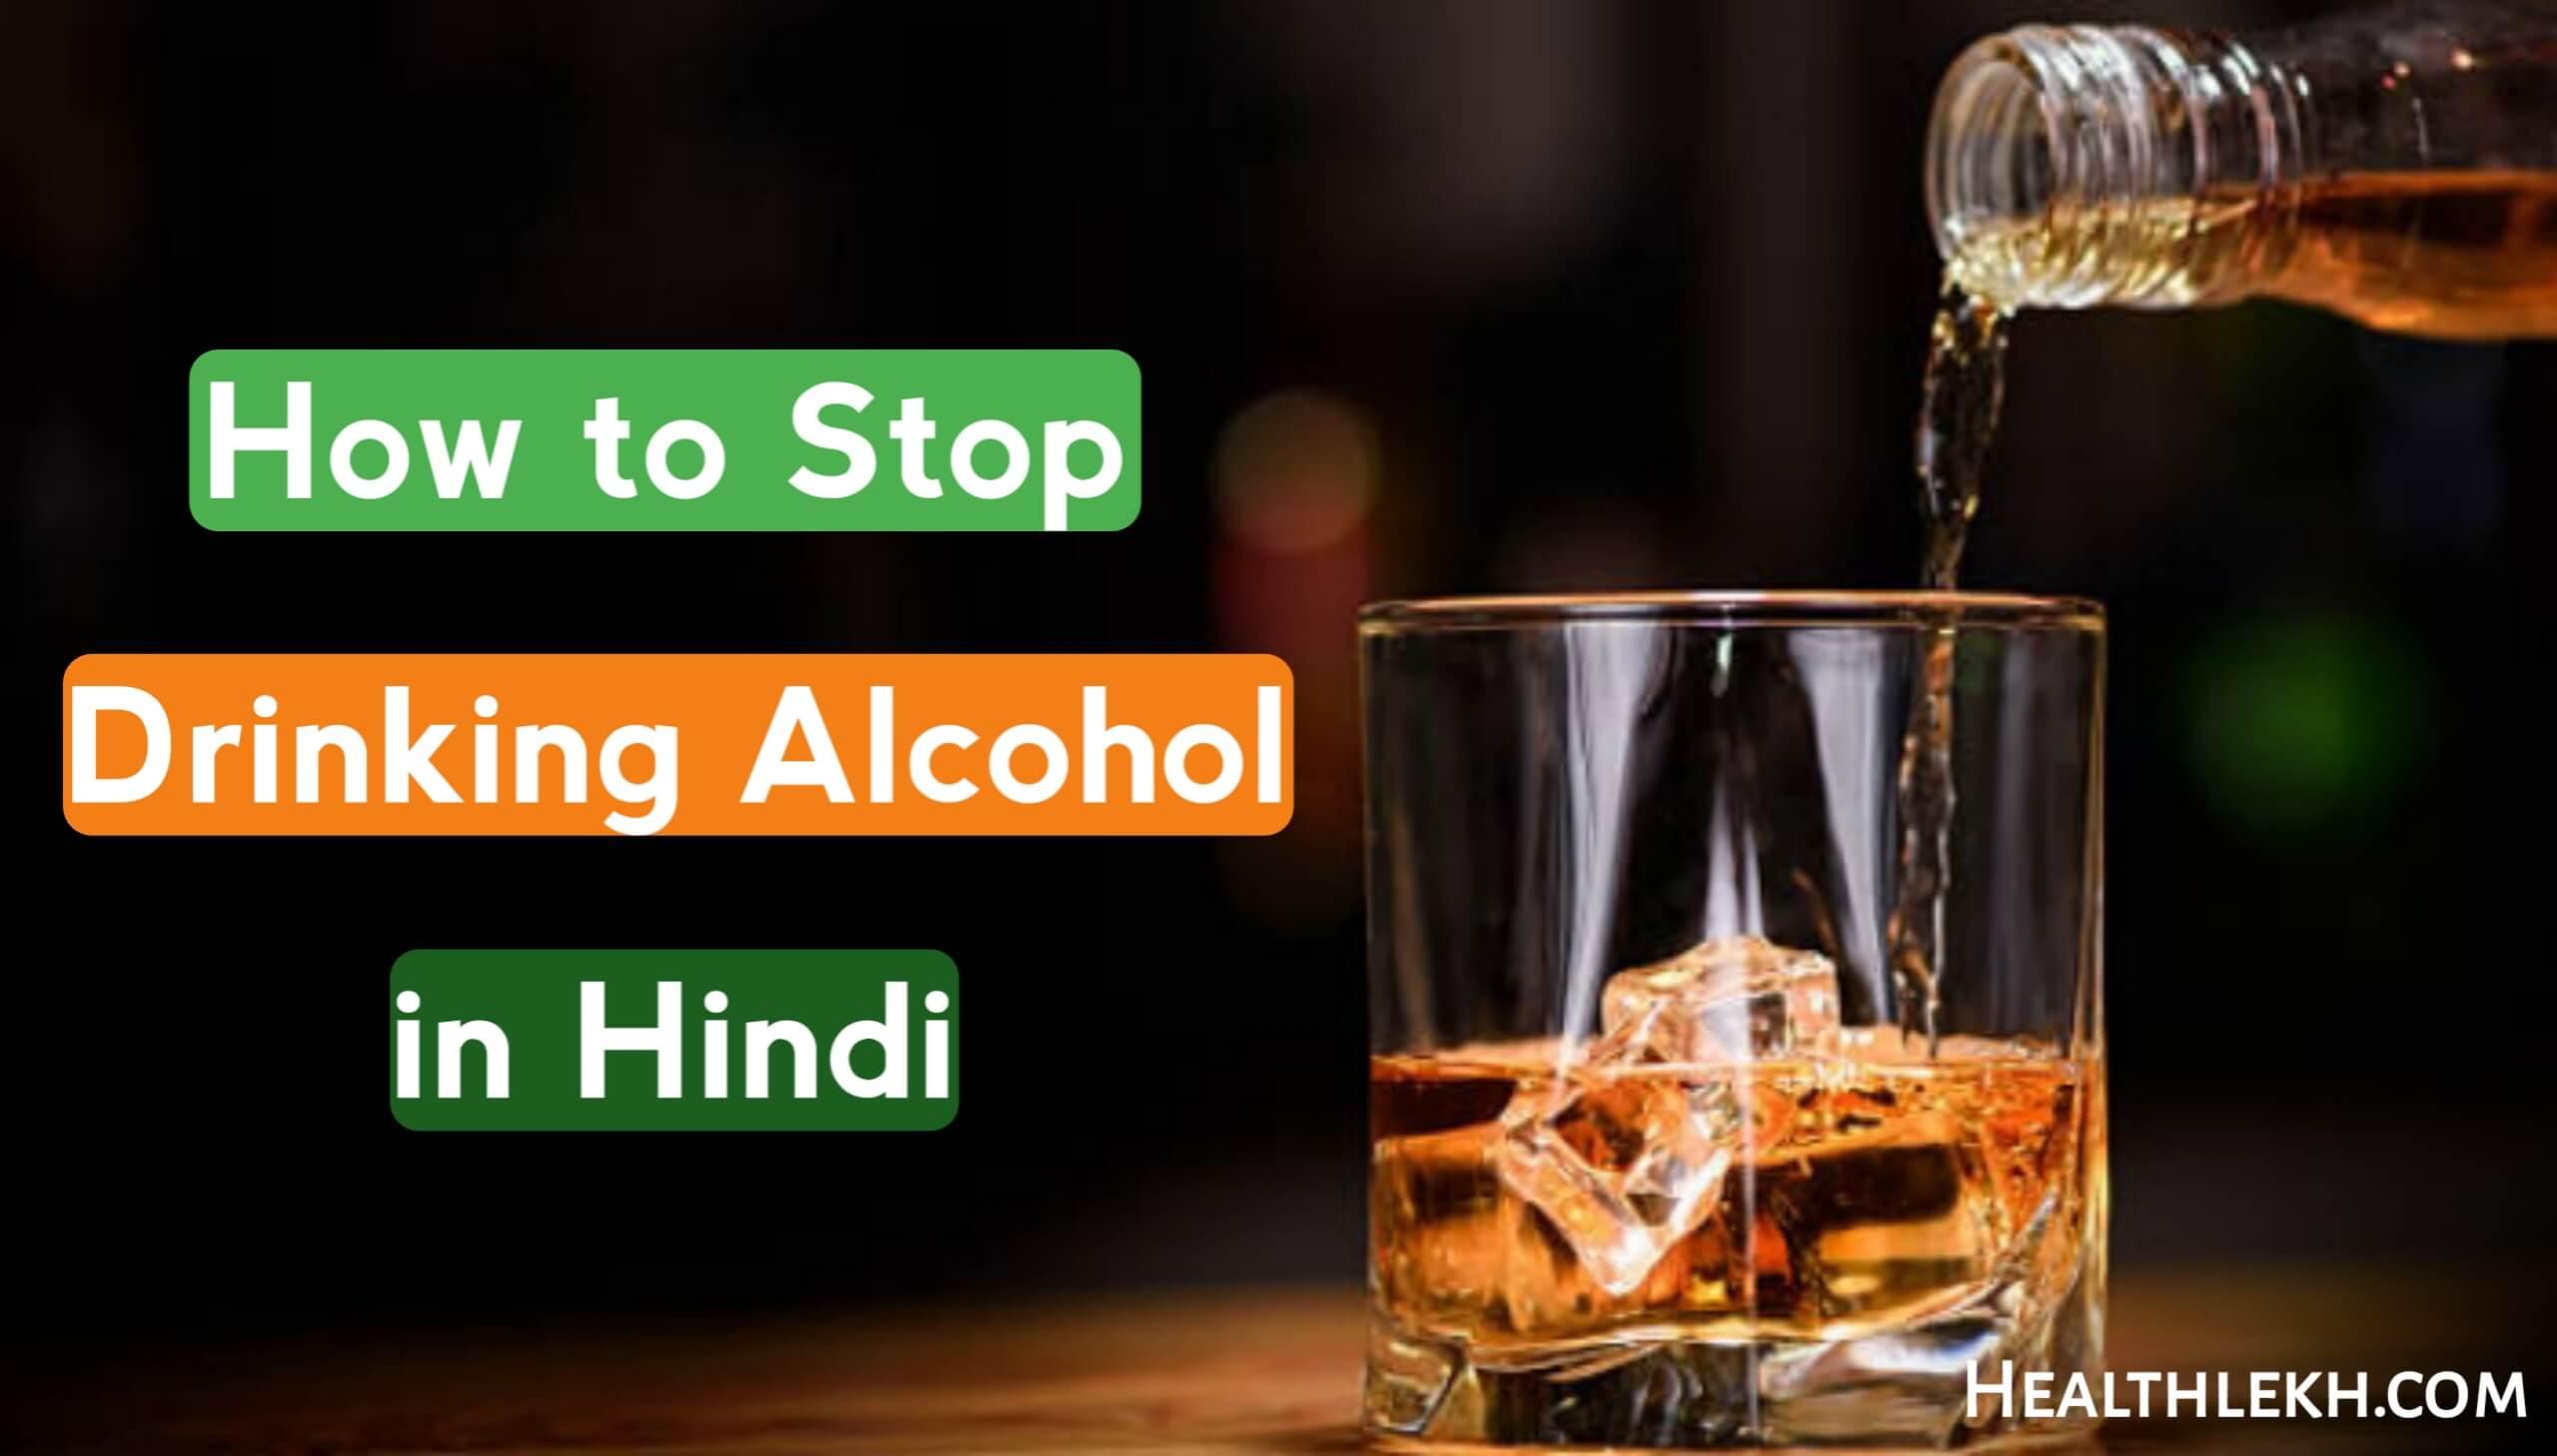 शराब छुड़ाने के आयुर्वेदिक उपाय/घरेलू उपाय,How to stop Drinking Alcohol in Hindi,sharab pina kaise chhode, alcohal ke nuksan,nashe ka nuksan